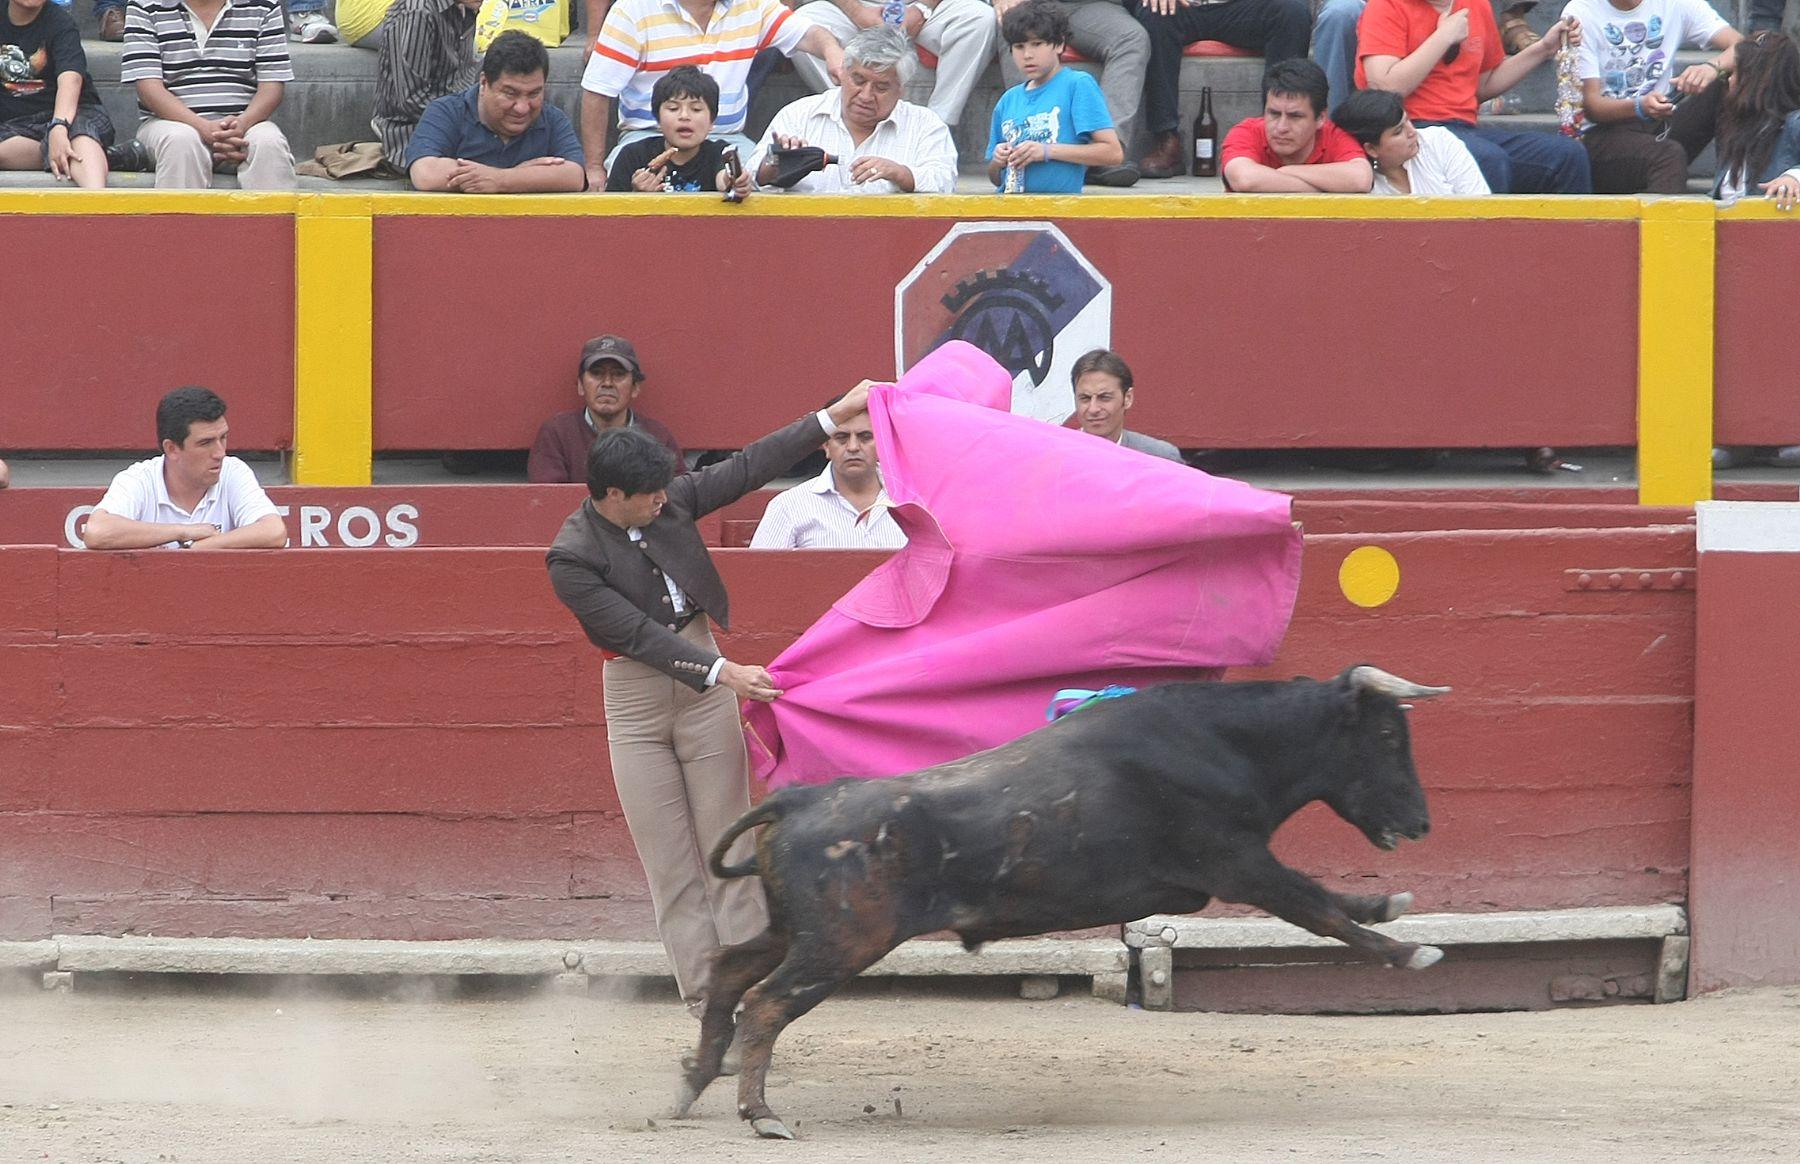 Club Hípico organiza festival taurino para financiar equinoterapia a favor de niños Down. Foto: ANDINA/Vidal Tarqui